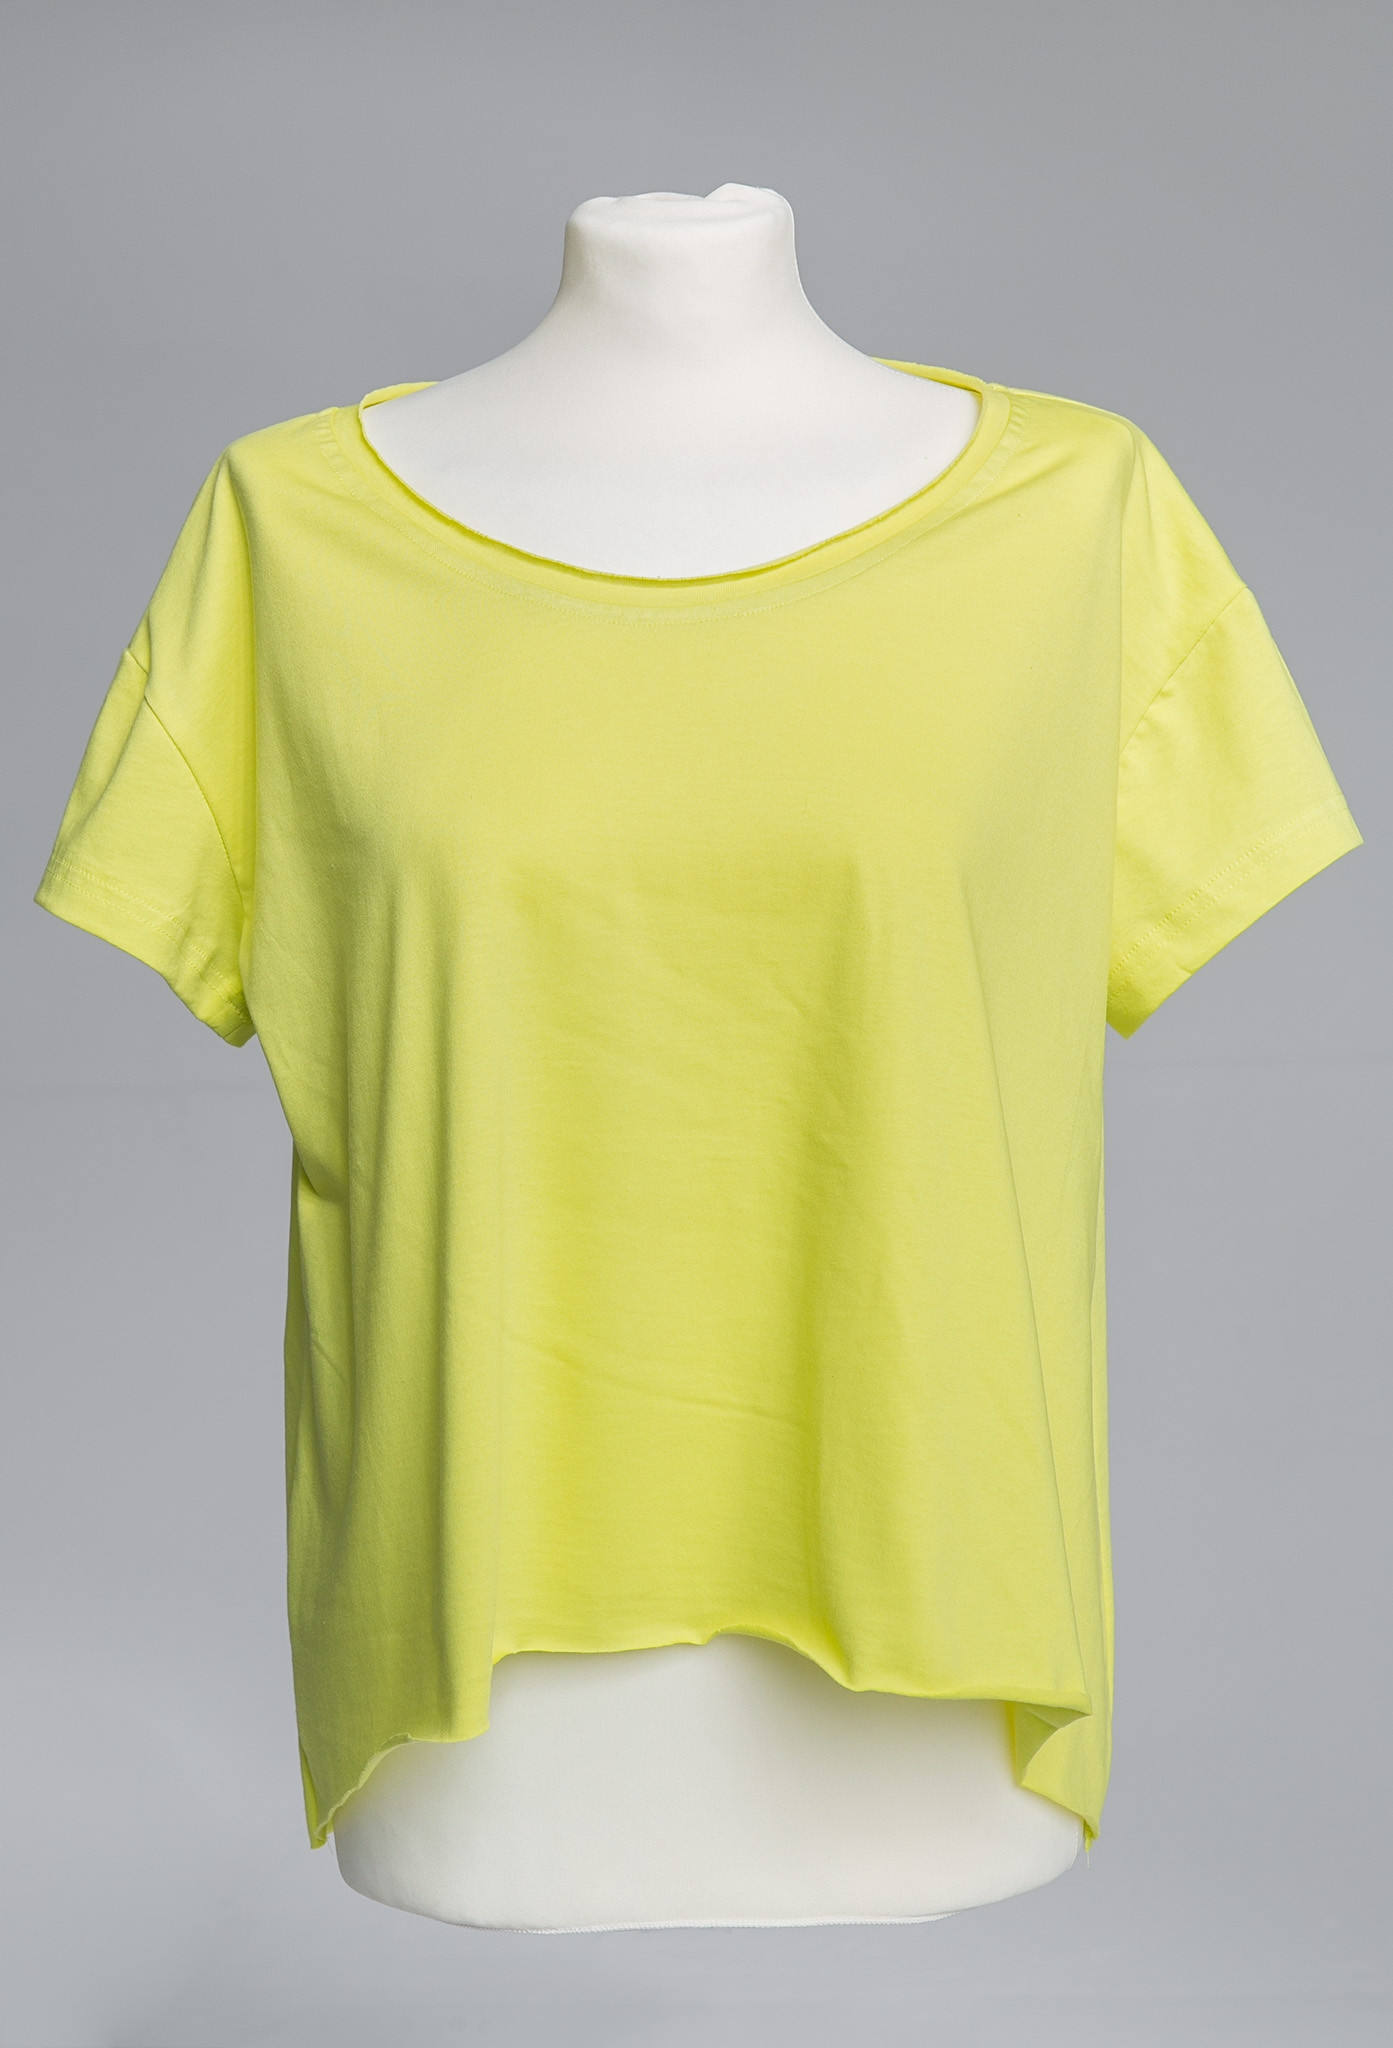 Tshirt Lemon WOMAN - The Same